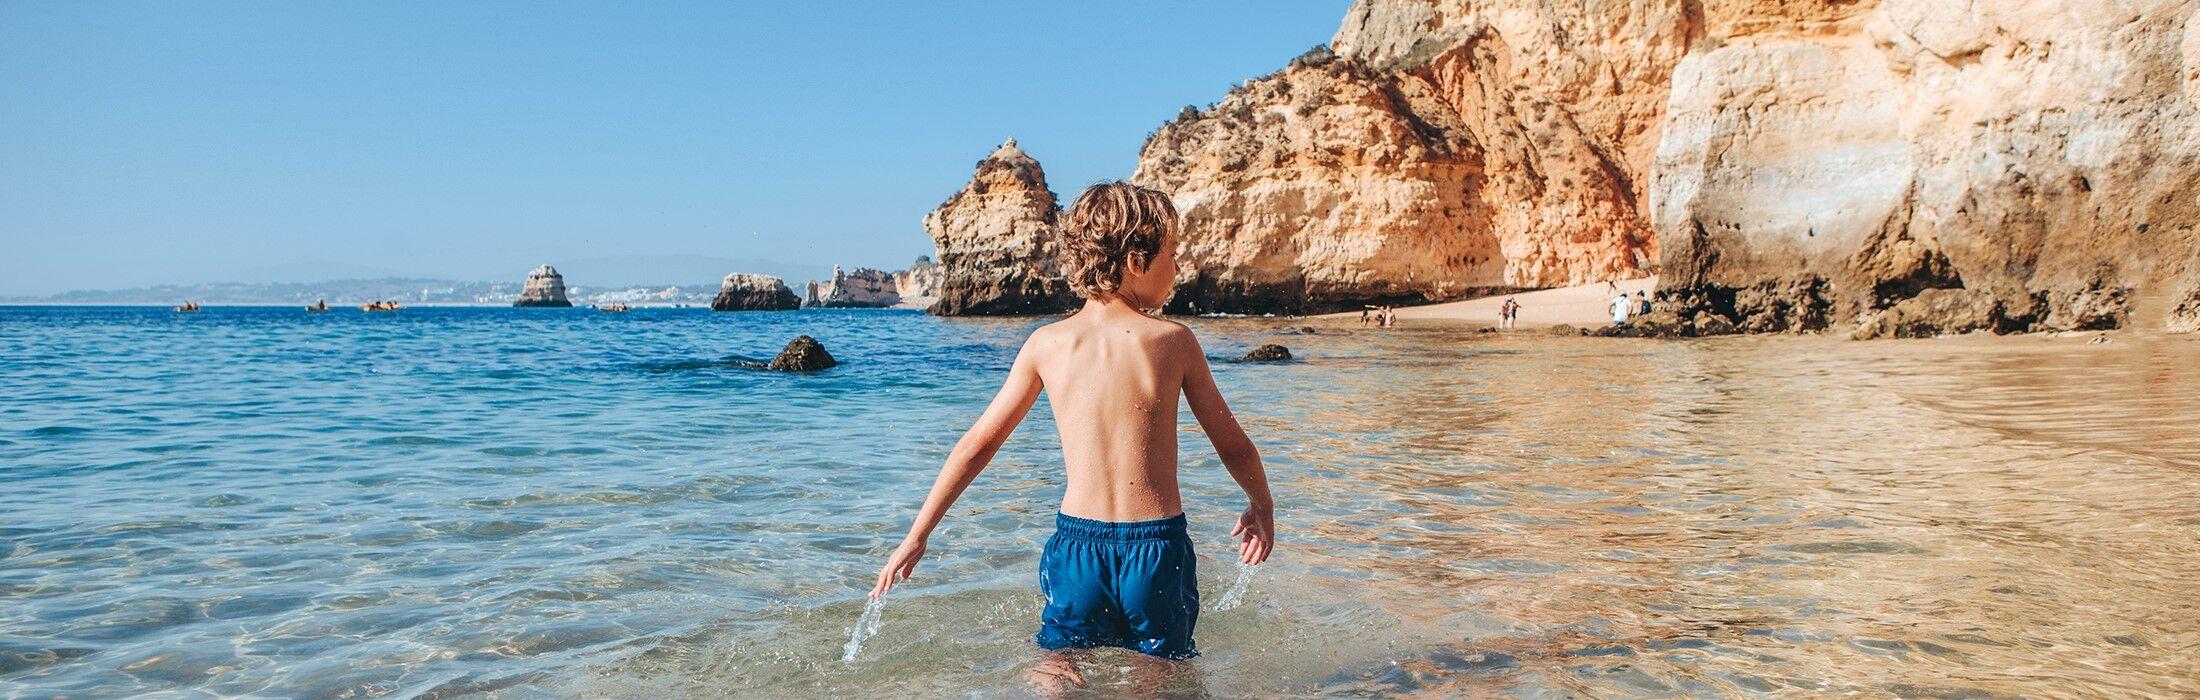 location vacances mer